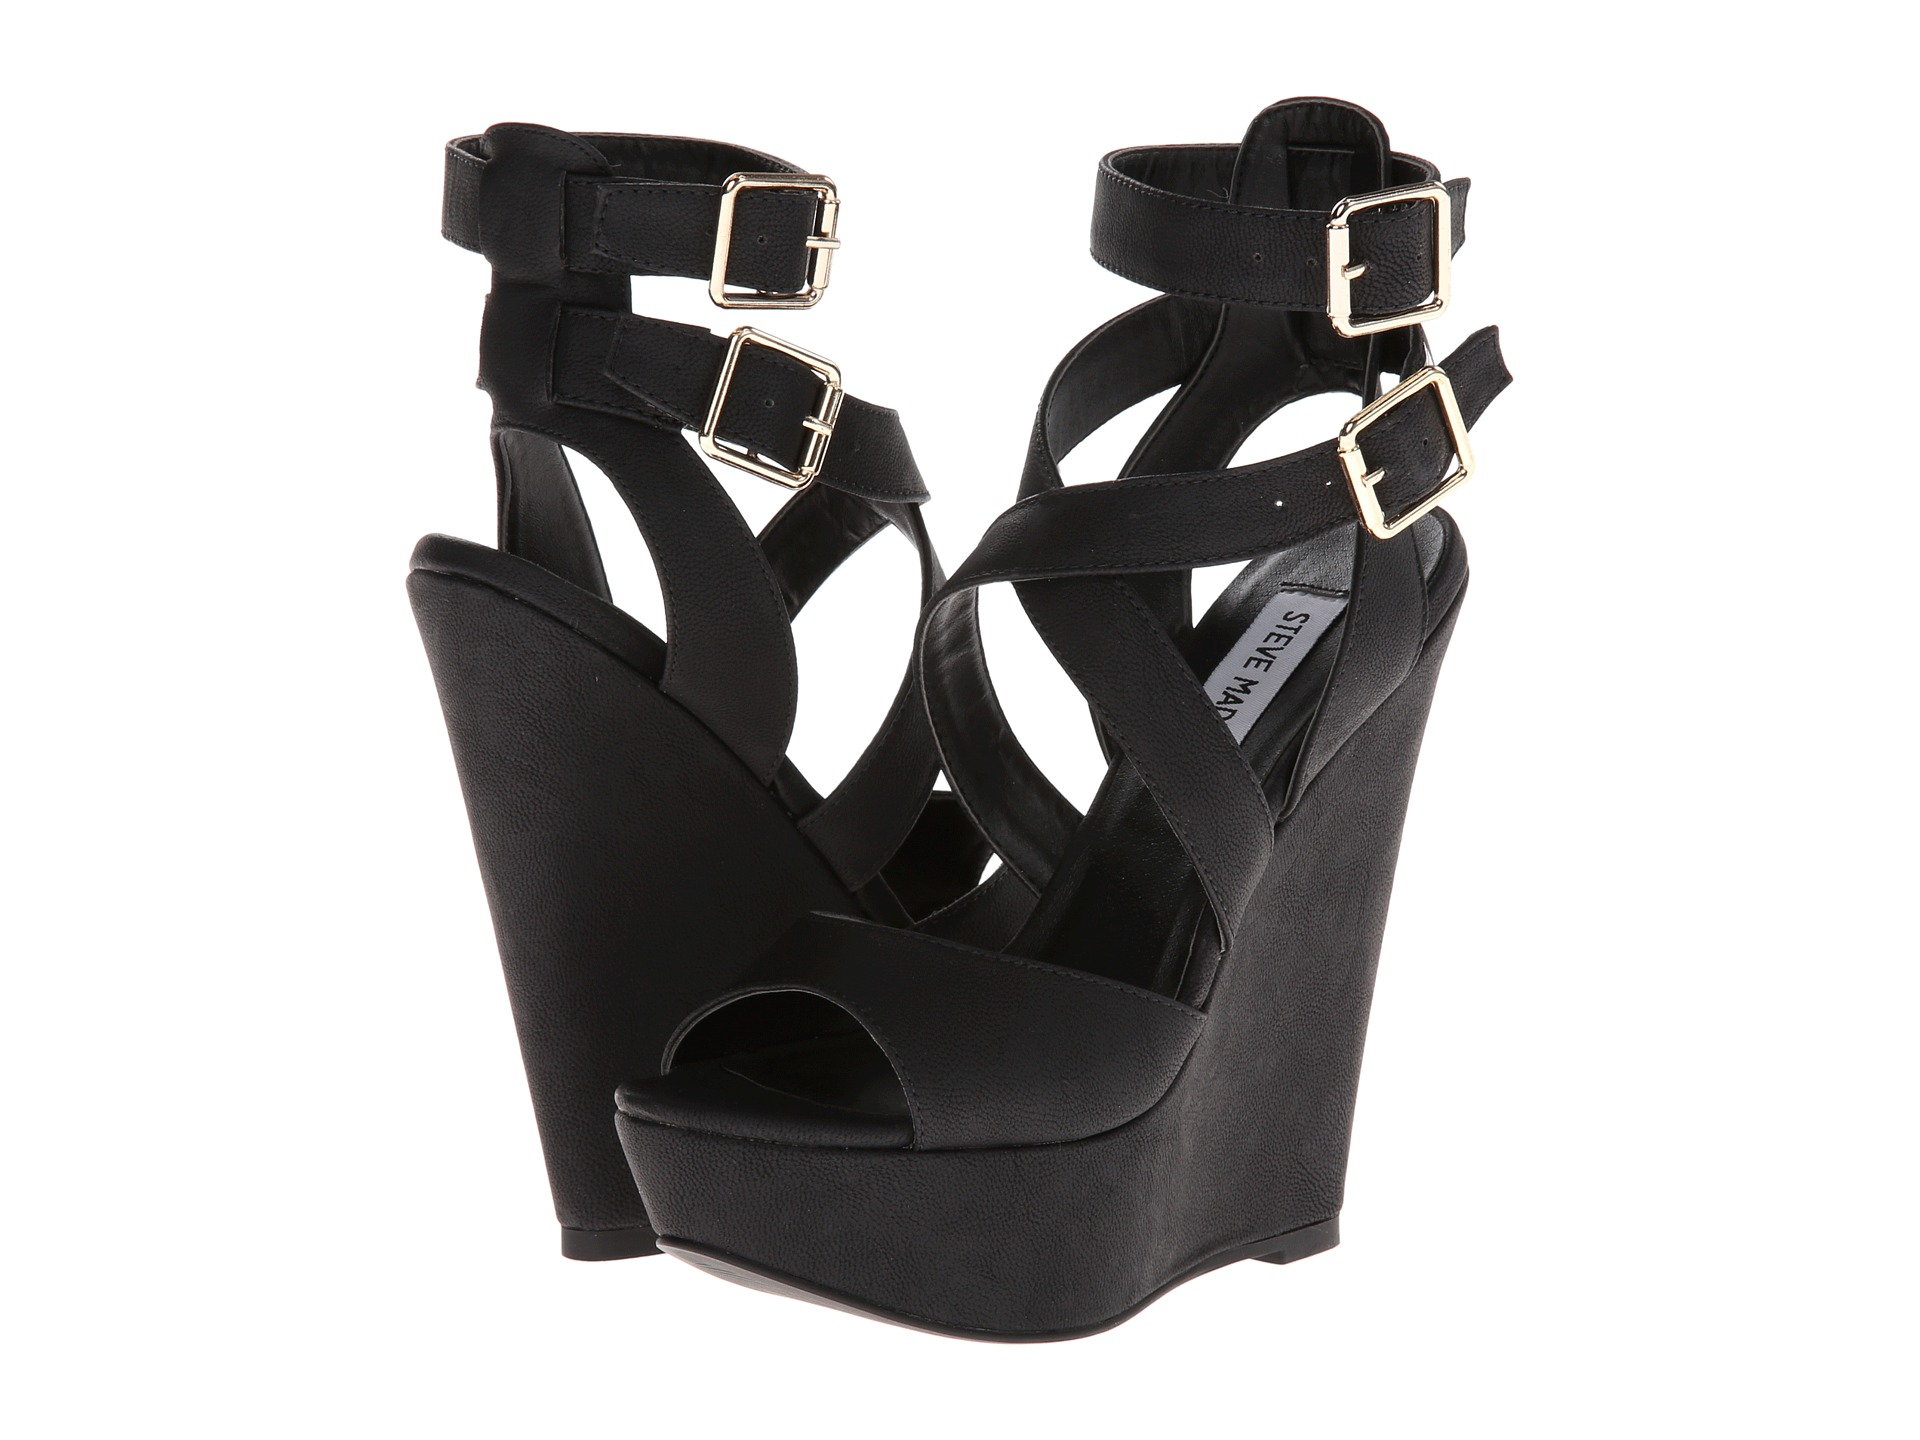 94e6939069b Black Platform Sandals: Steve Madden Xfoliate